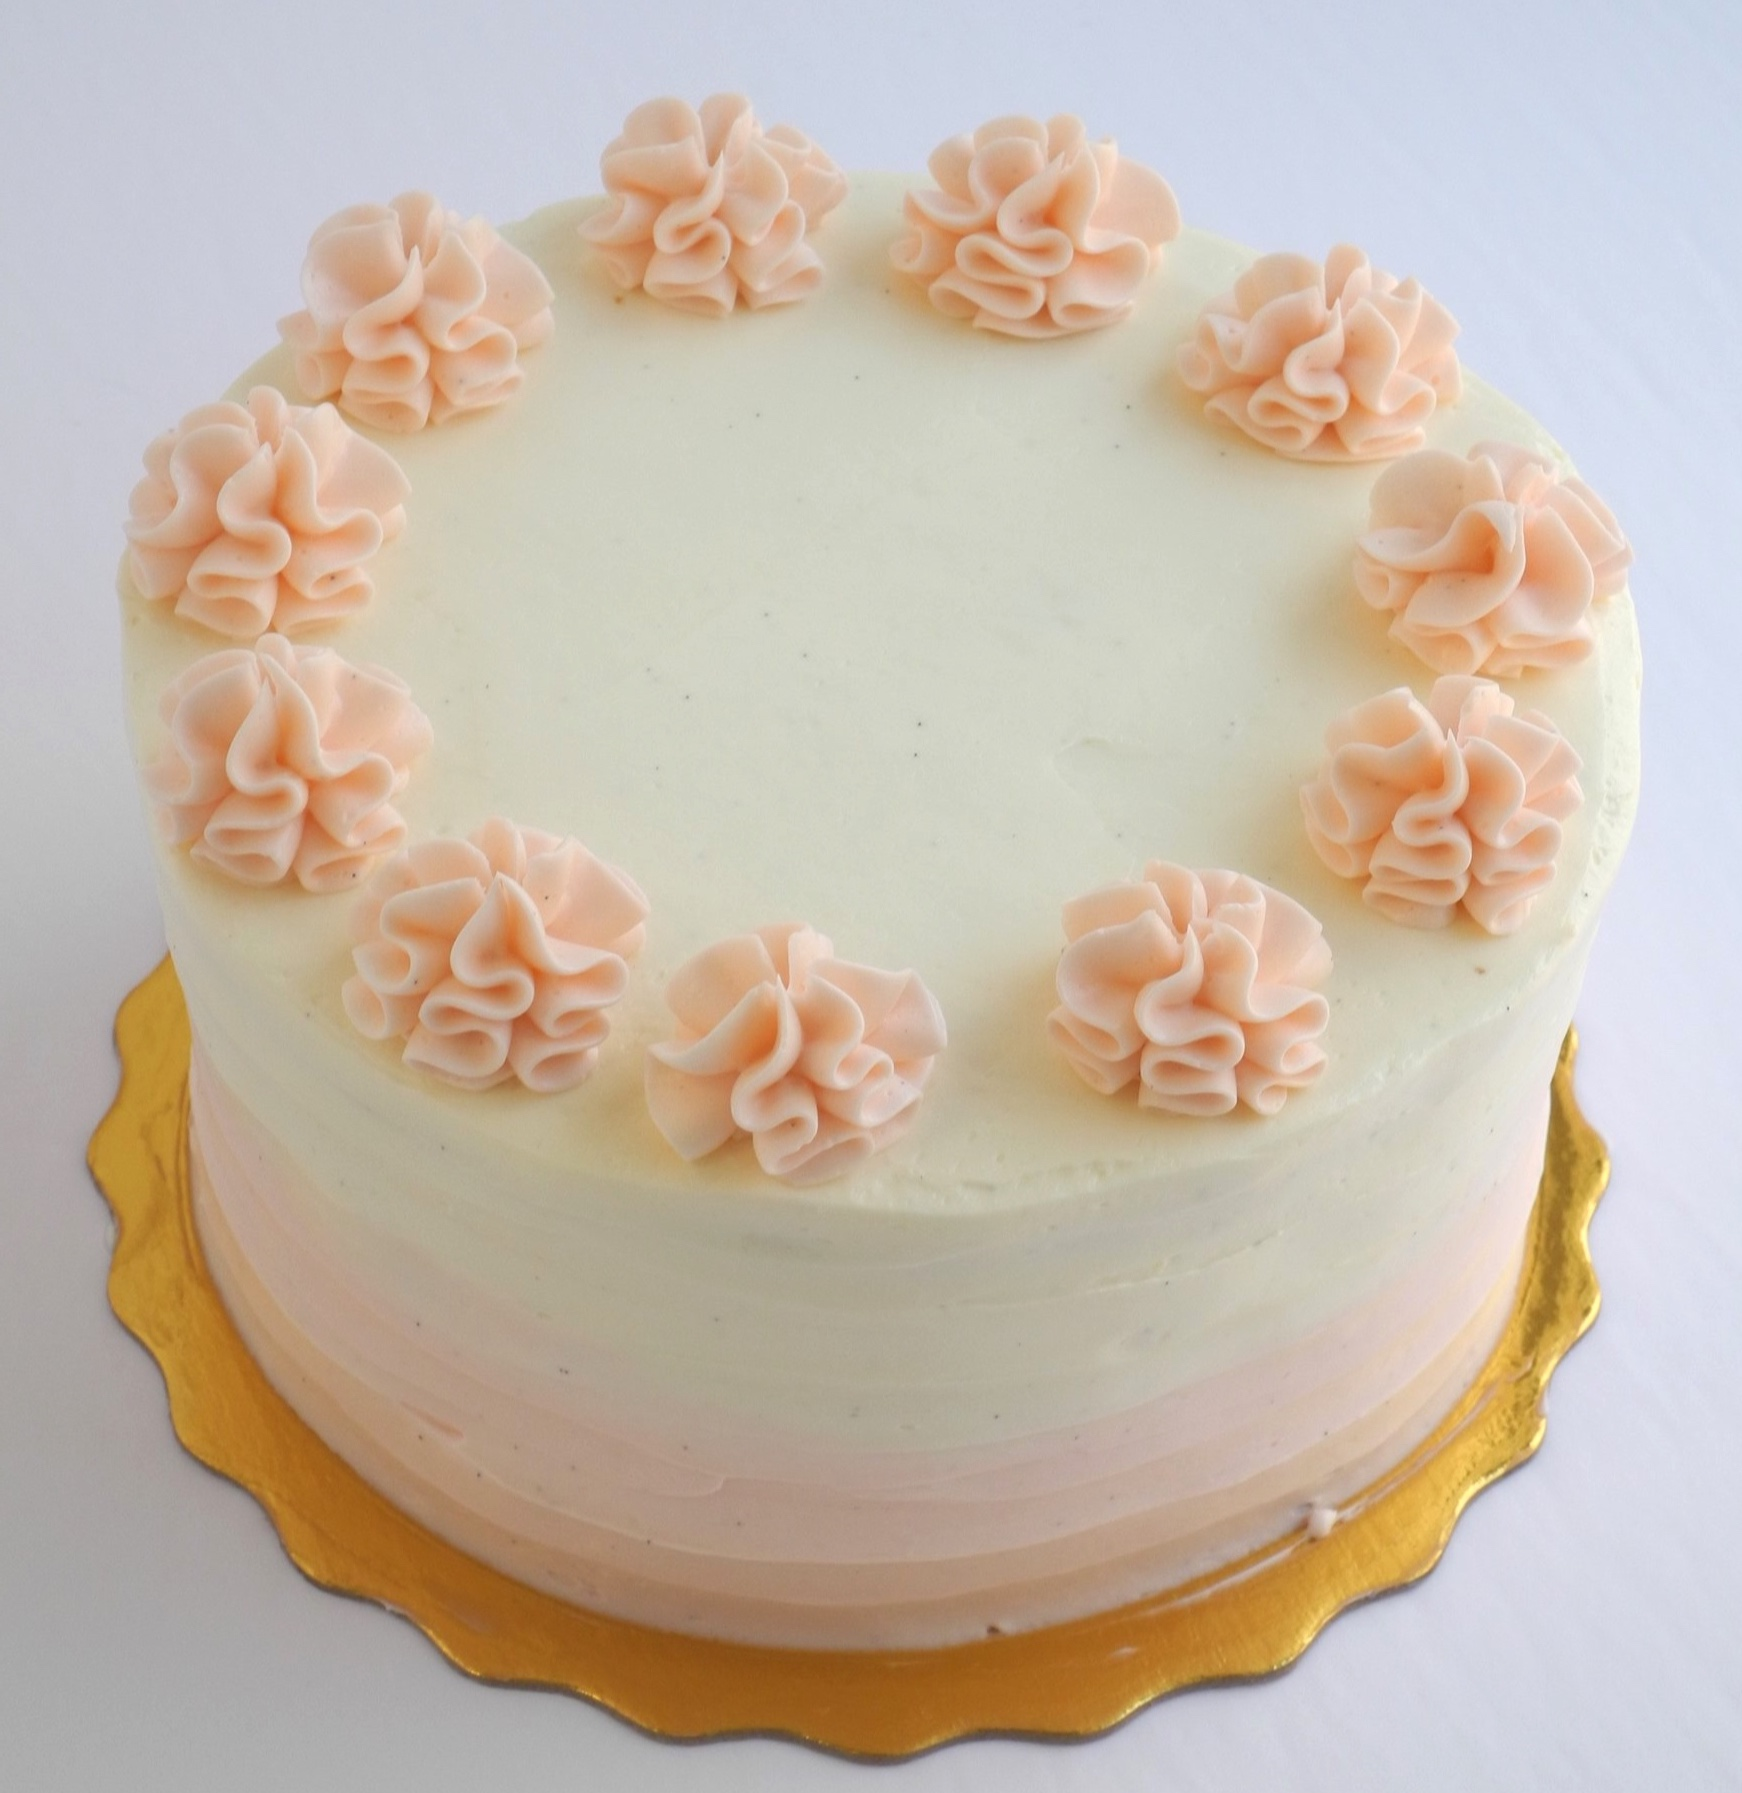 Event & Birthday Cakes | Bake Shop Studio London Ontario